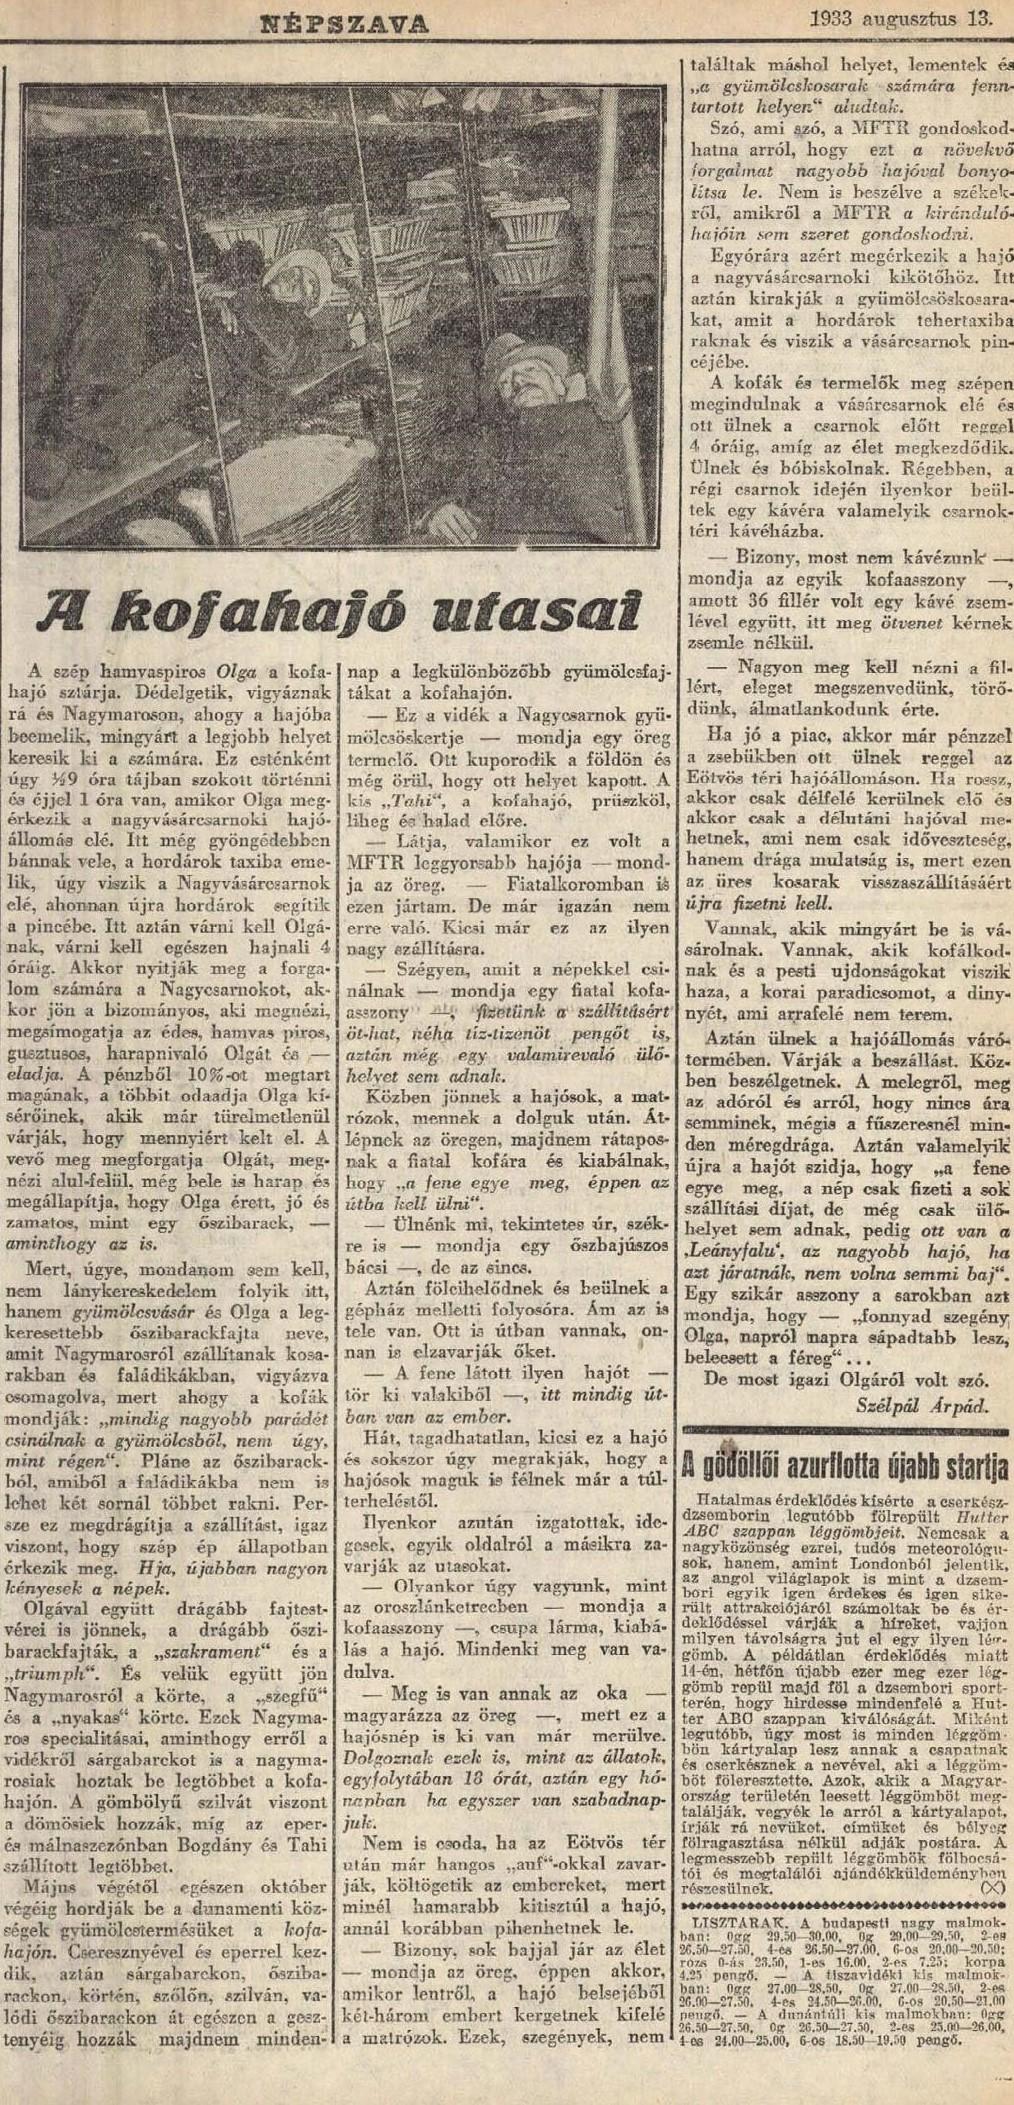 nepszava_1933_08_pages126-126.jpg